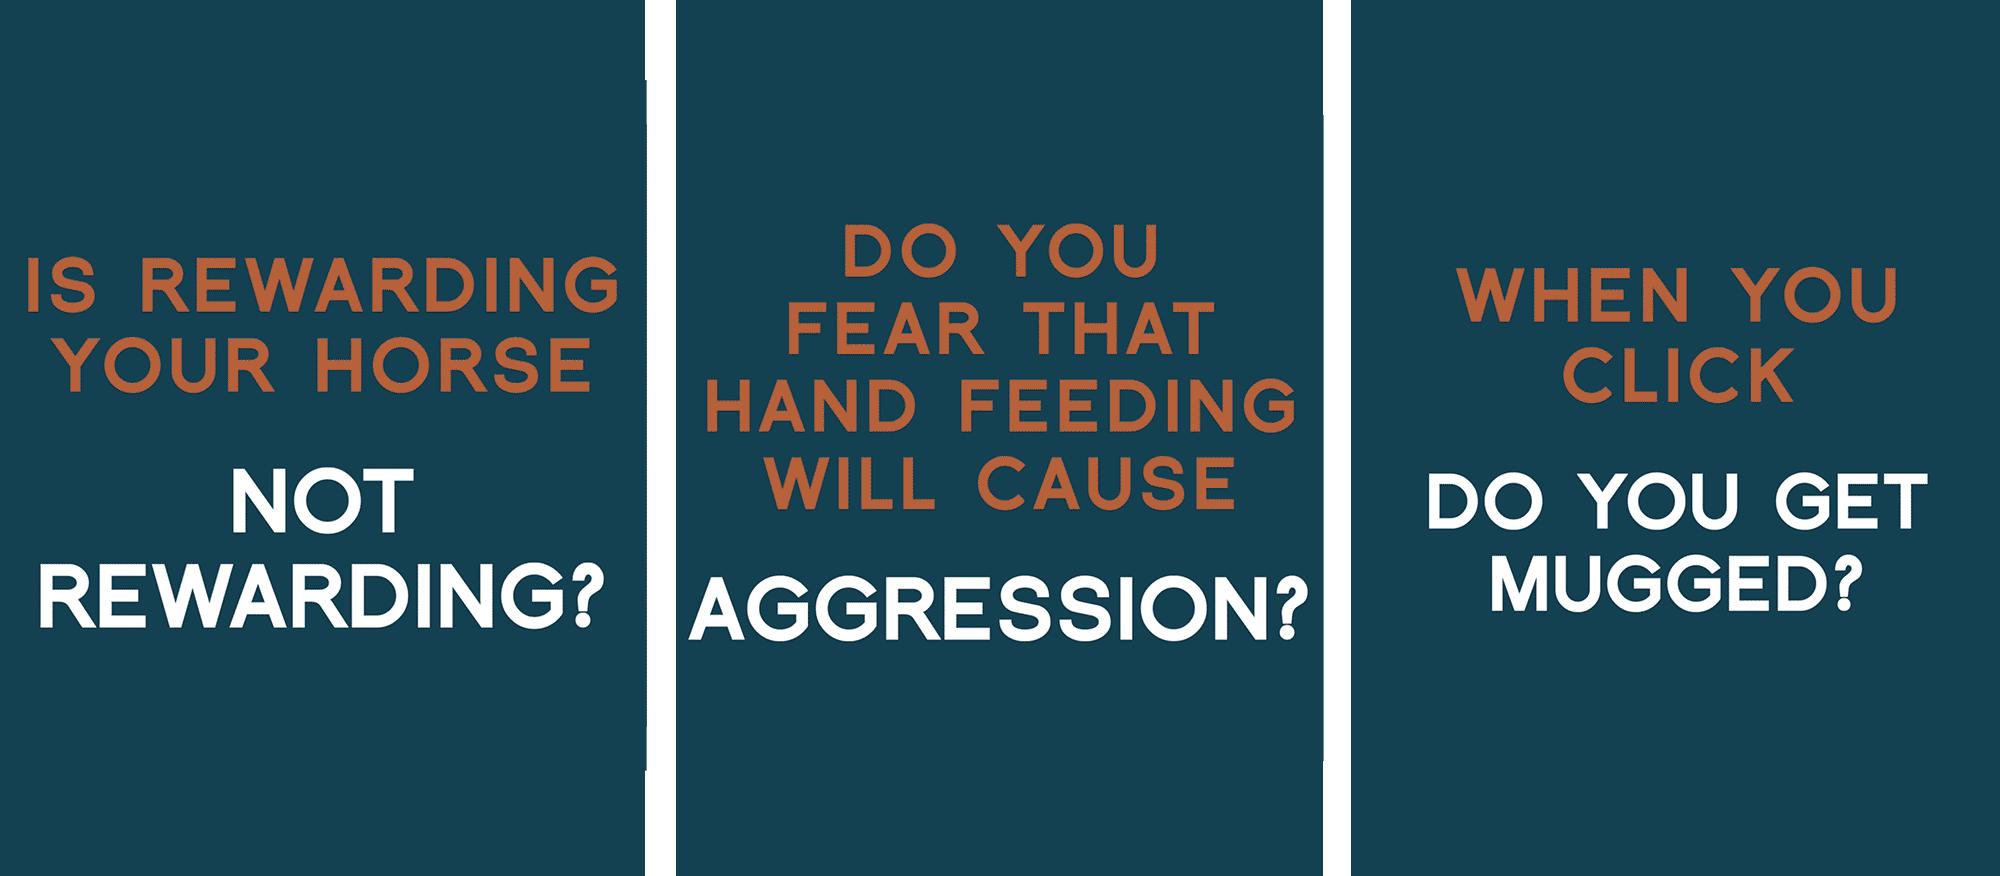 hand feeding safely